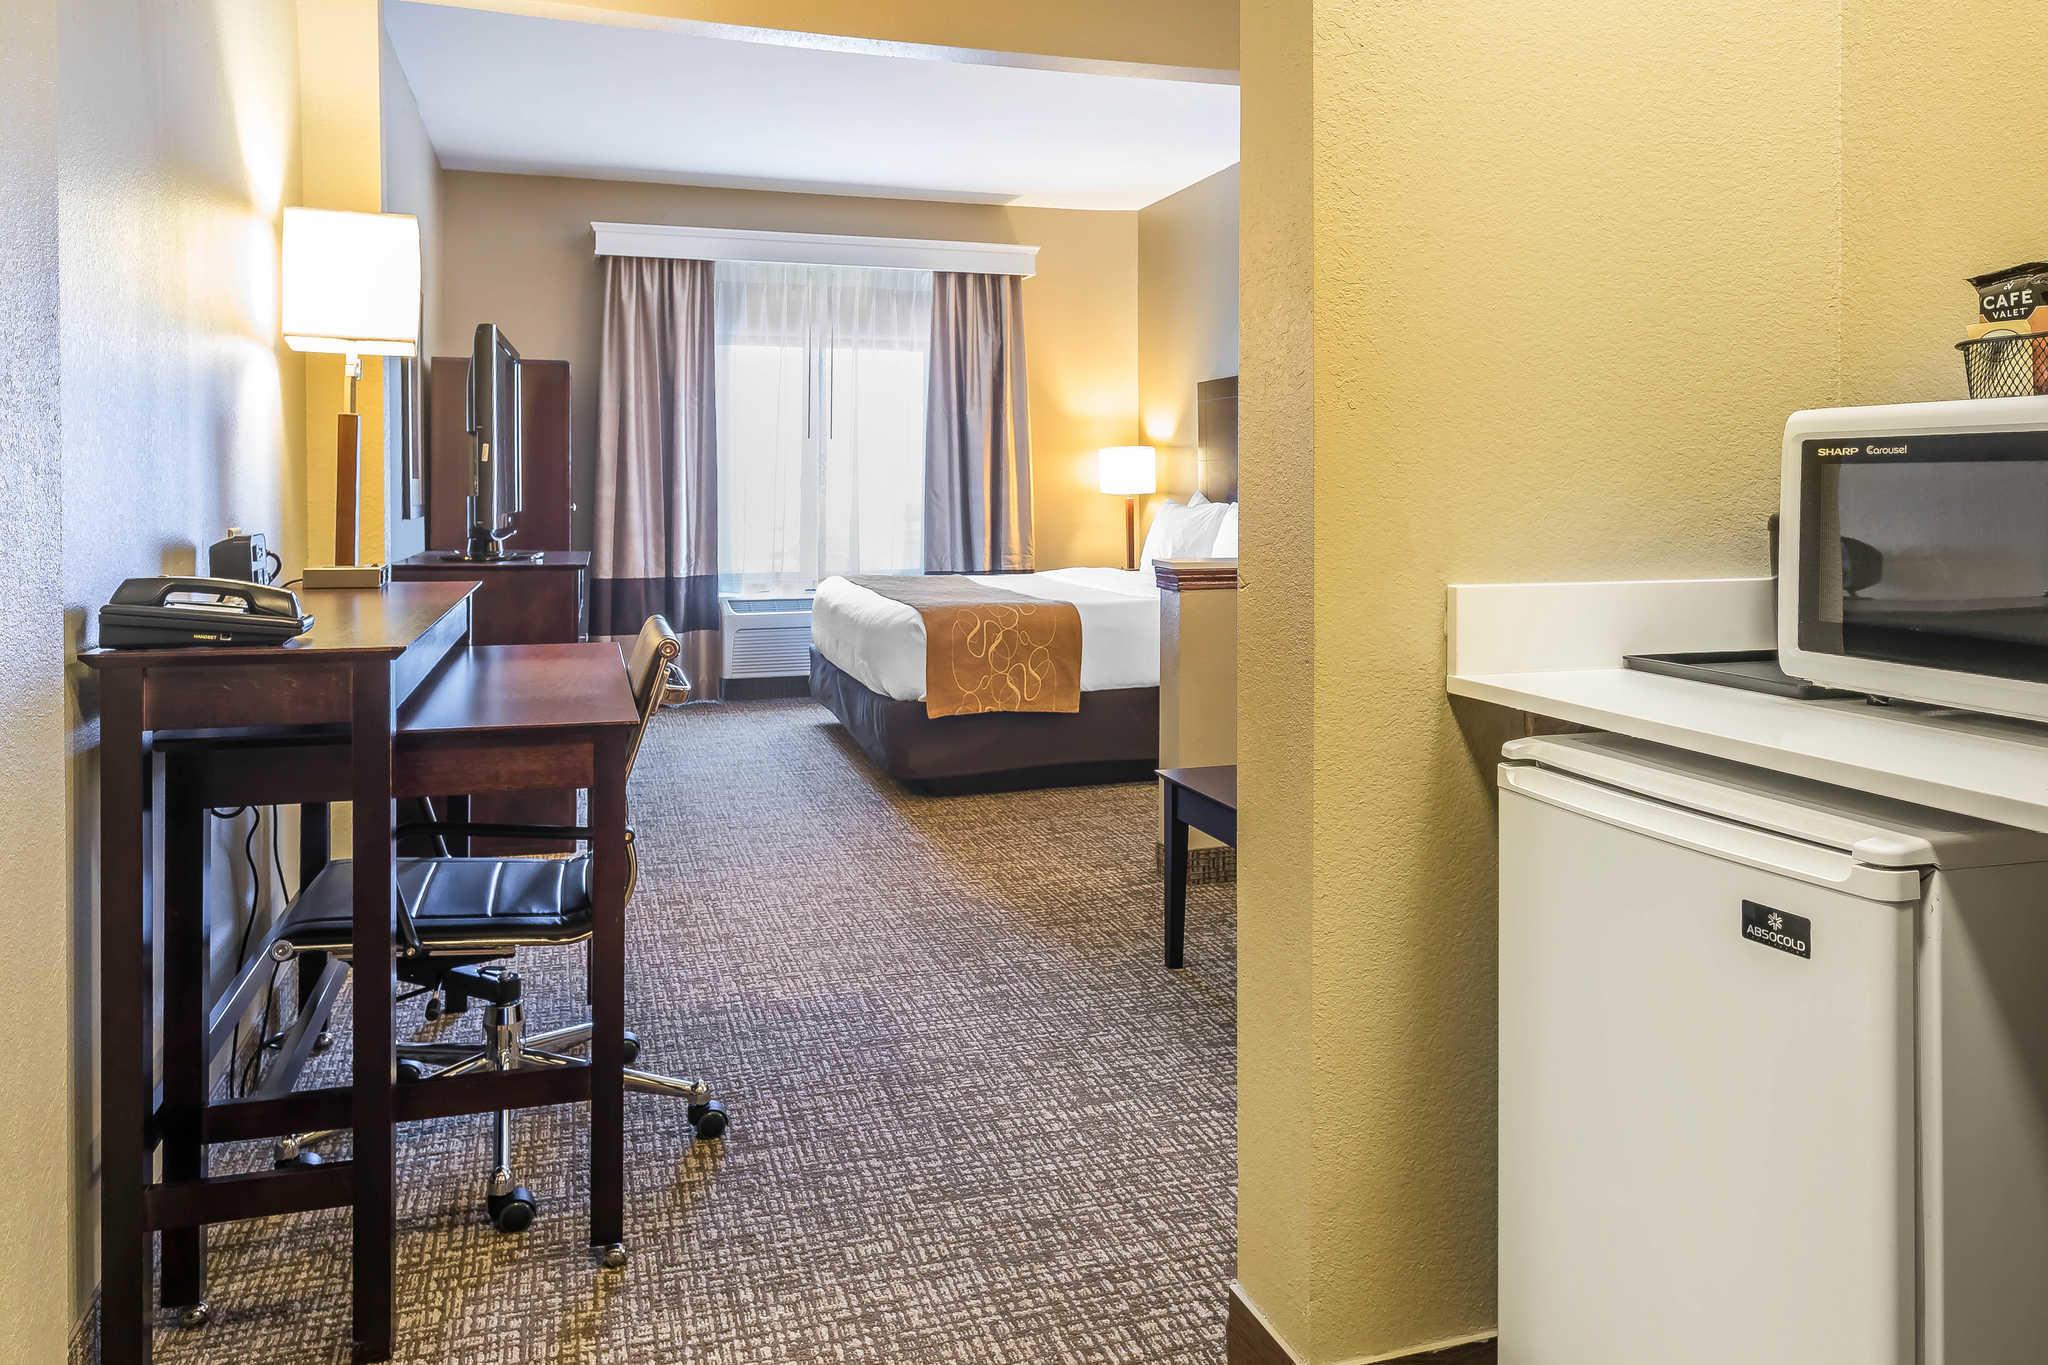 Comfort Suites North image 31